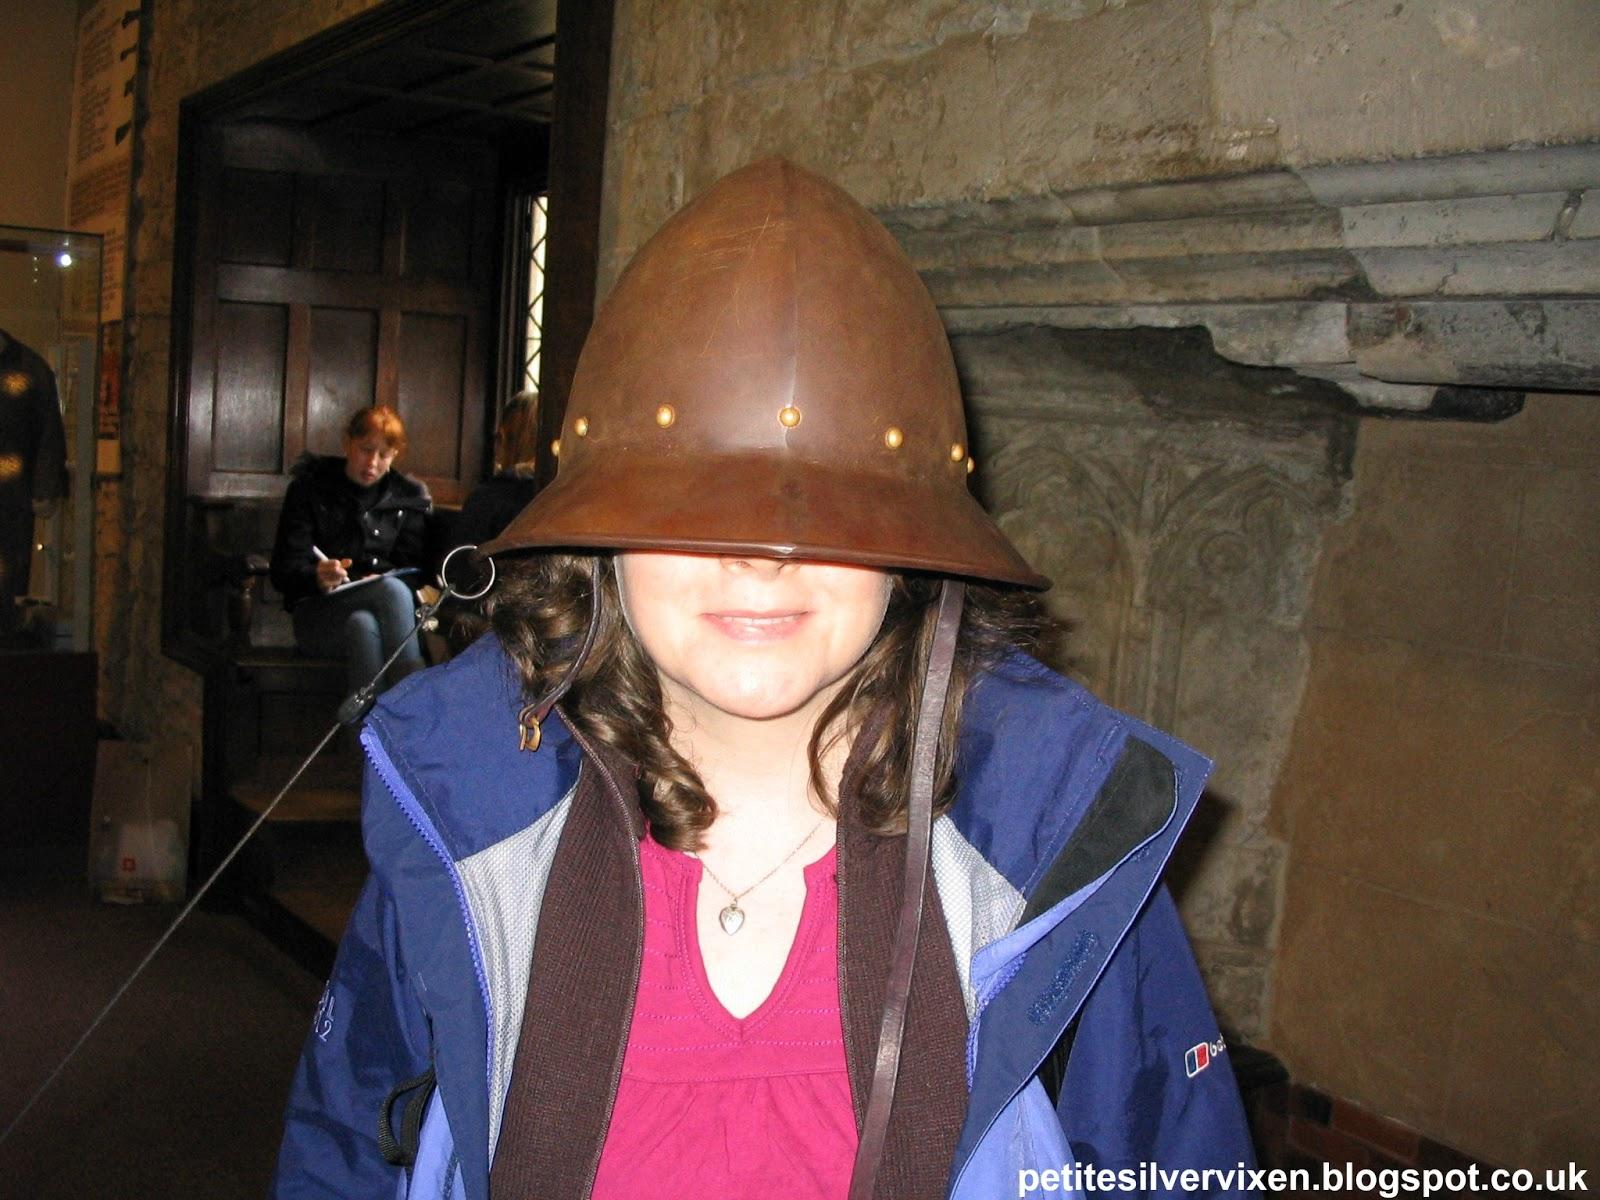 Petite Silver Vixen wearing a replica Cavalier Helmet covering eyes | Petite Silver Vixen